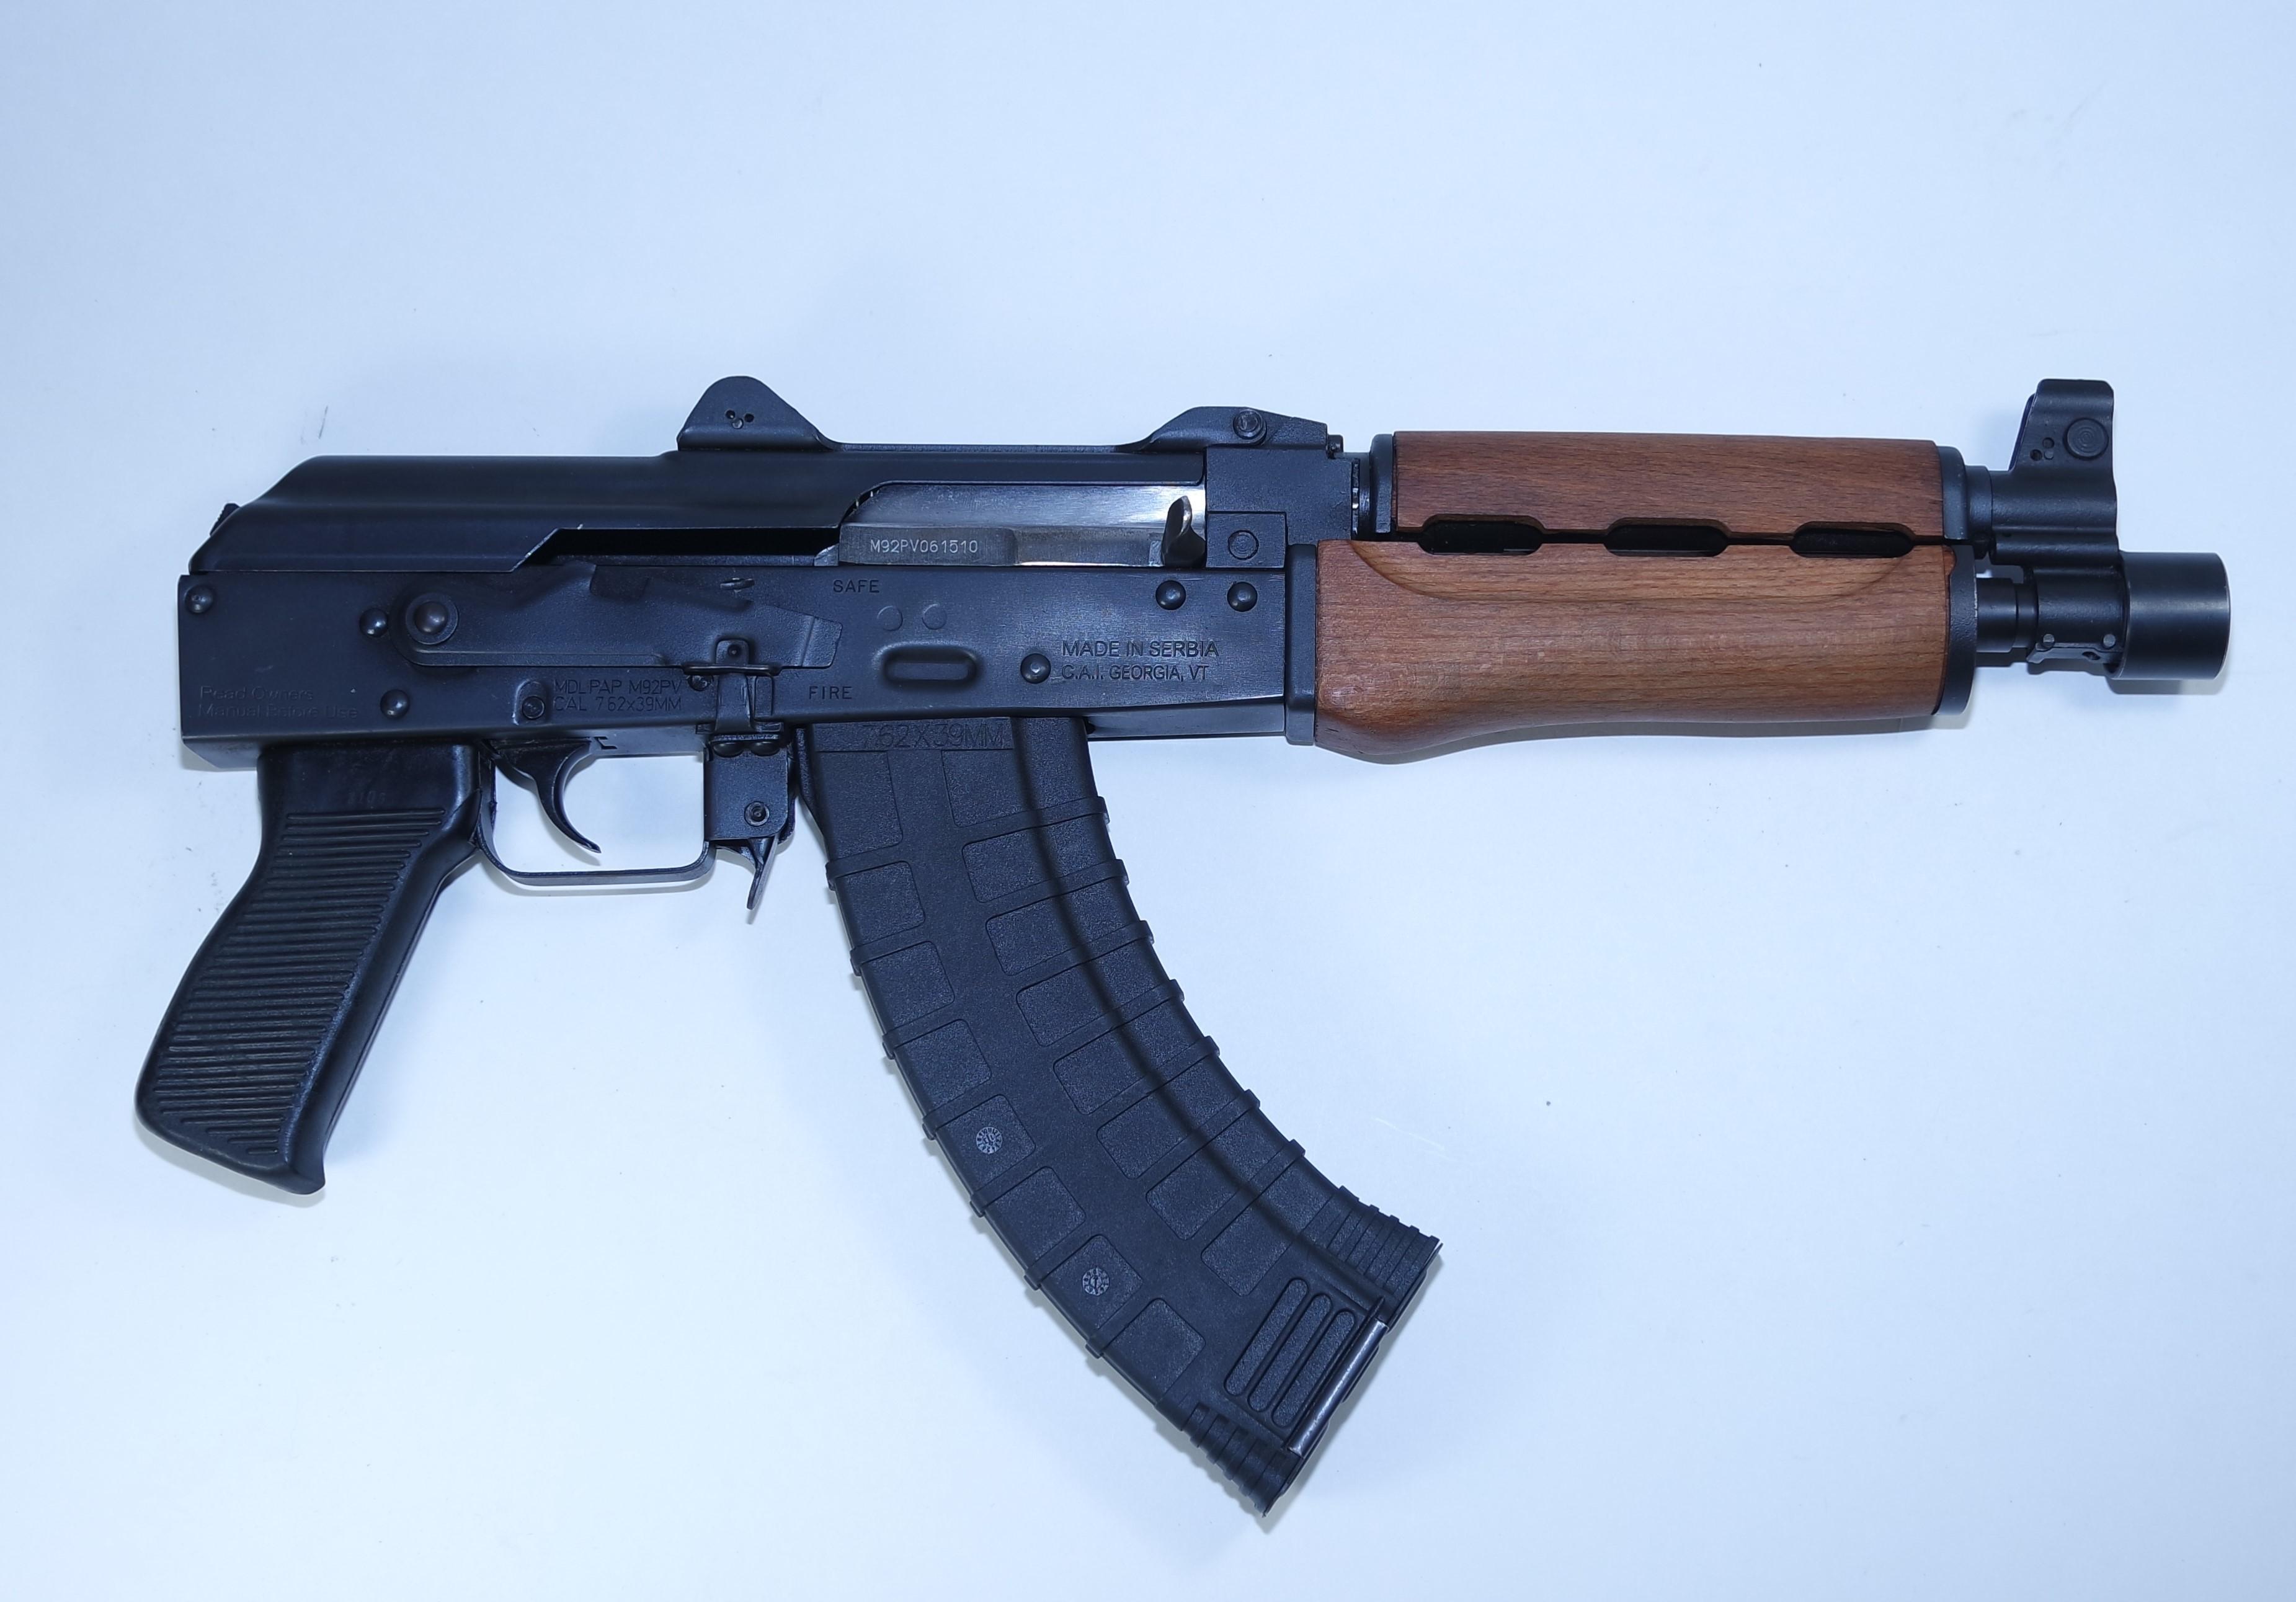 Zastava Serbia AK Pistol M92PV 10